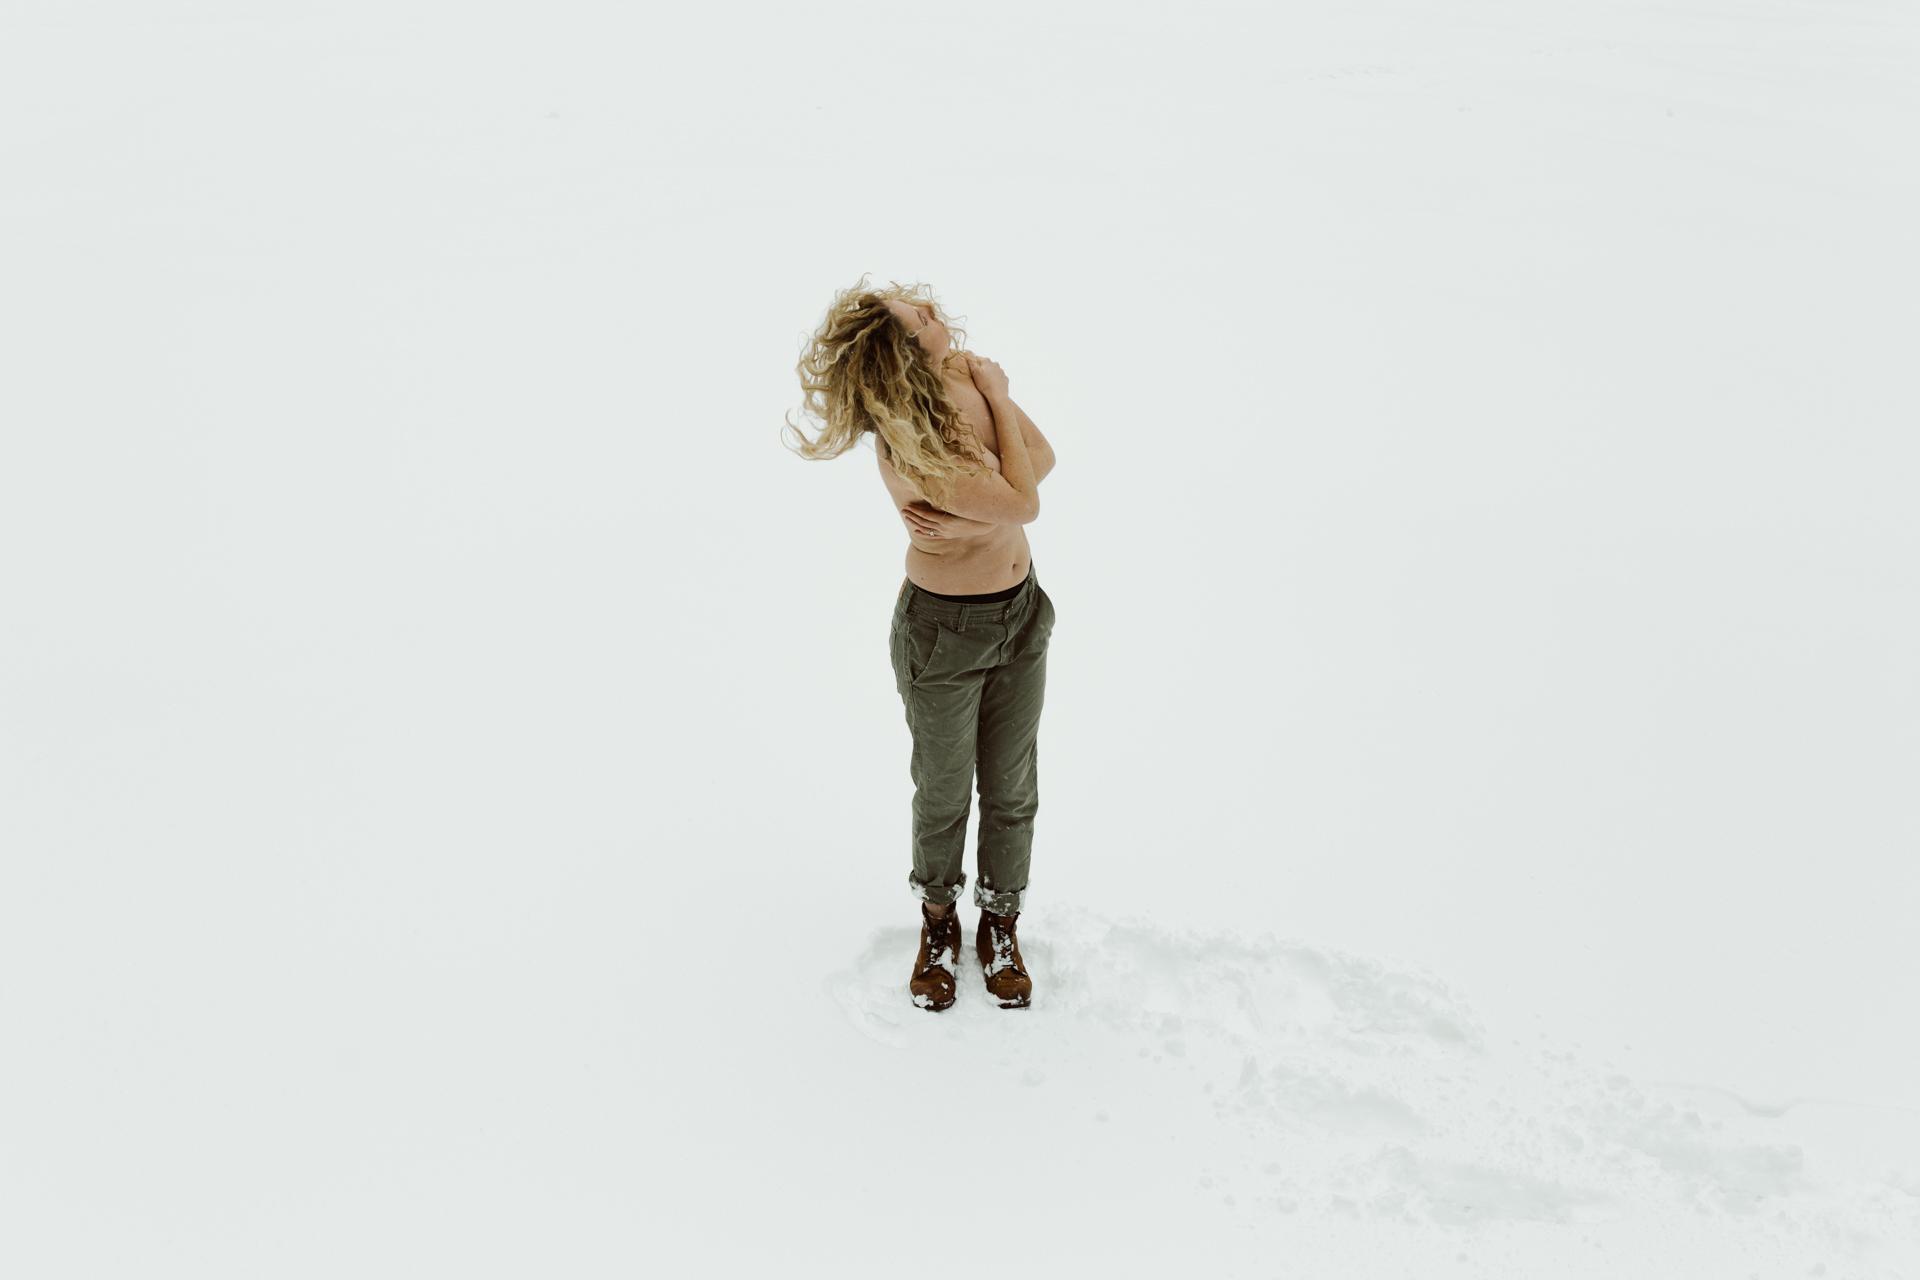 rachel_snow_storm_model-1014.jpg